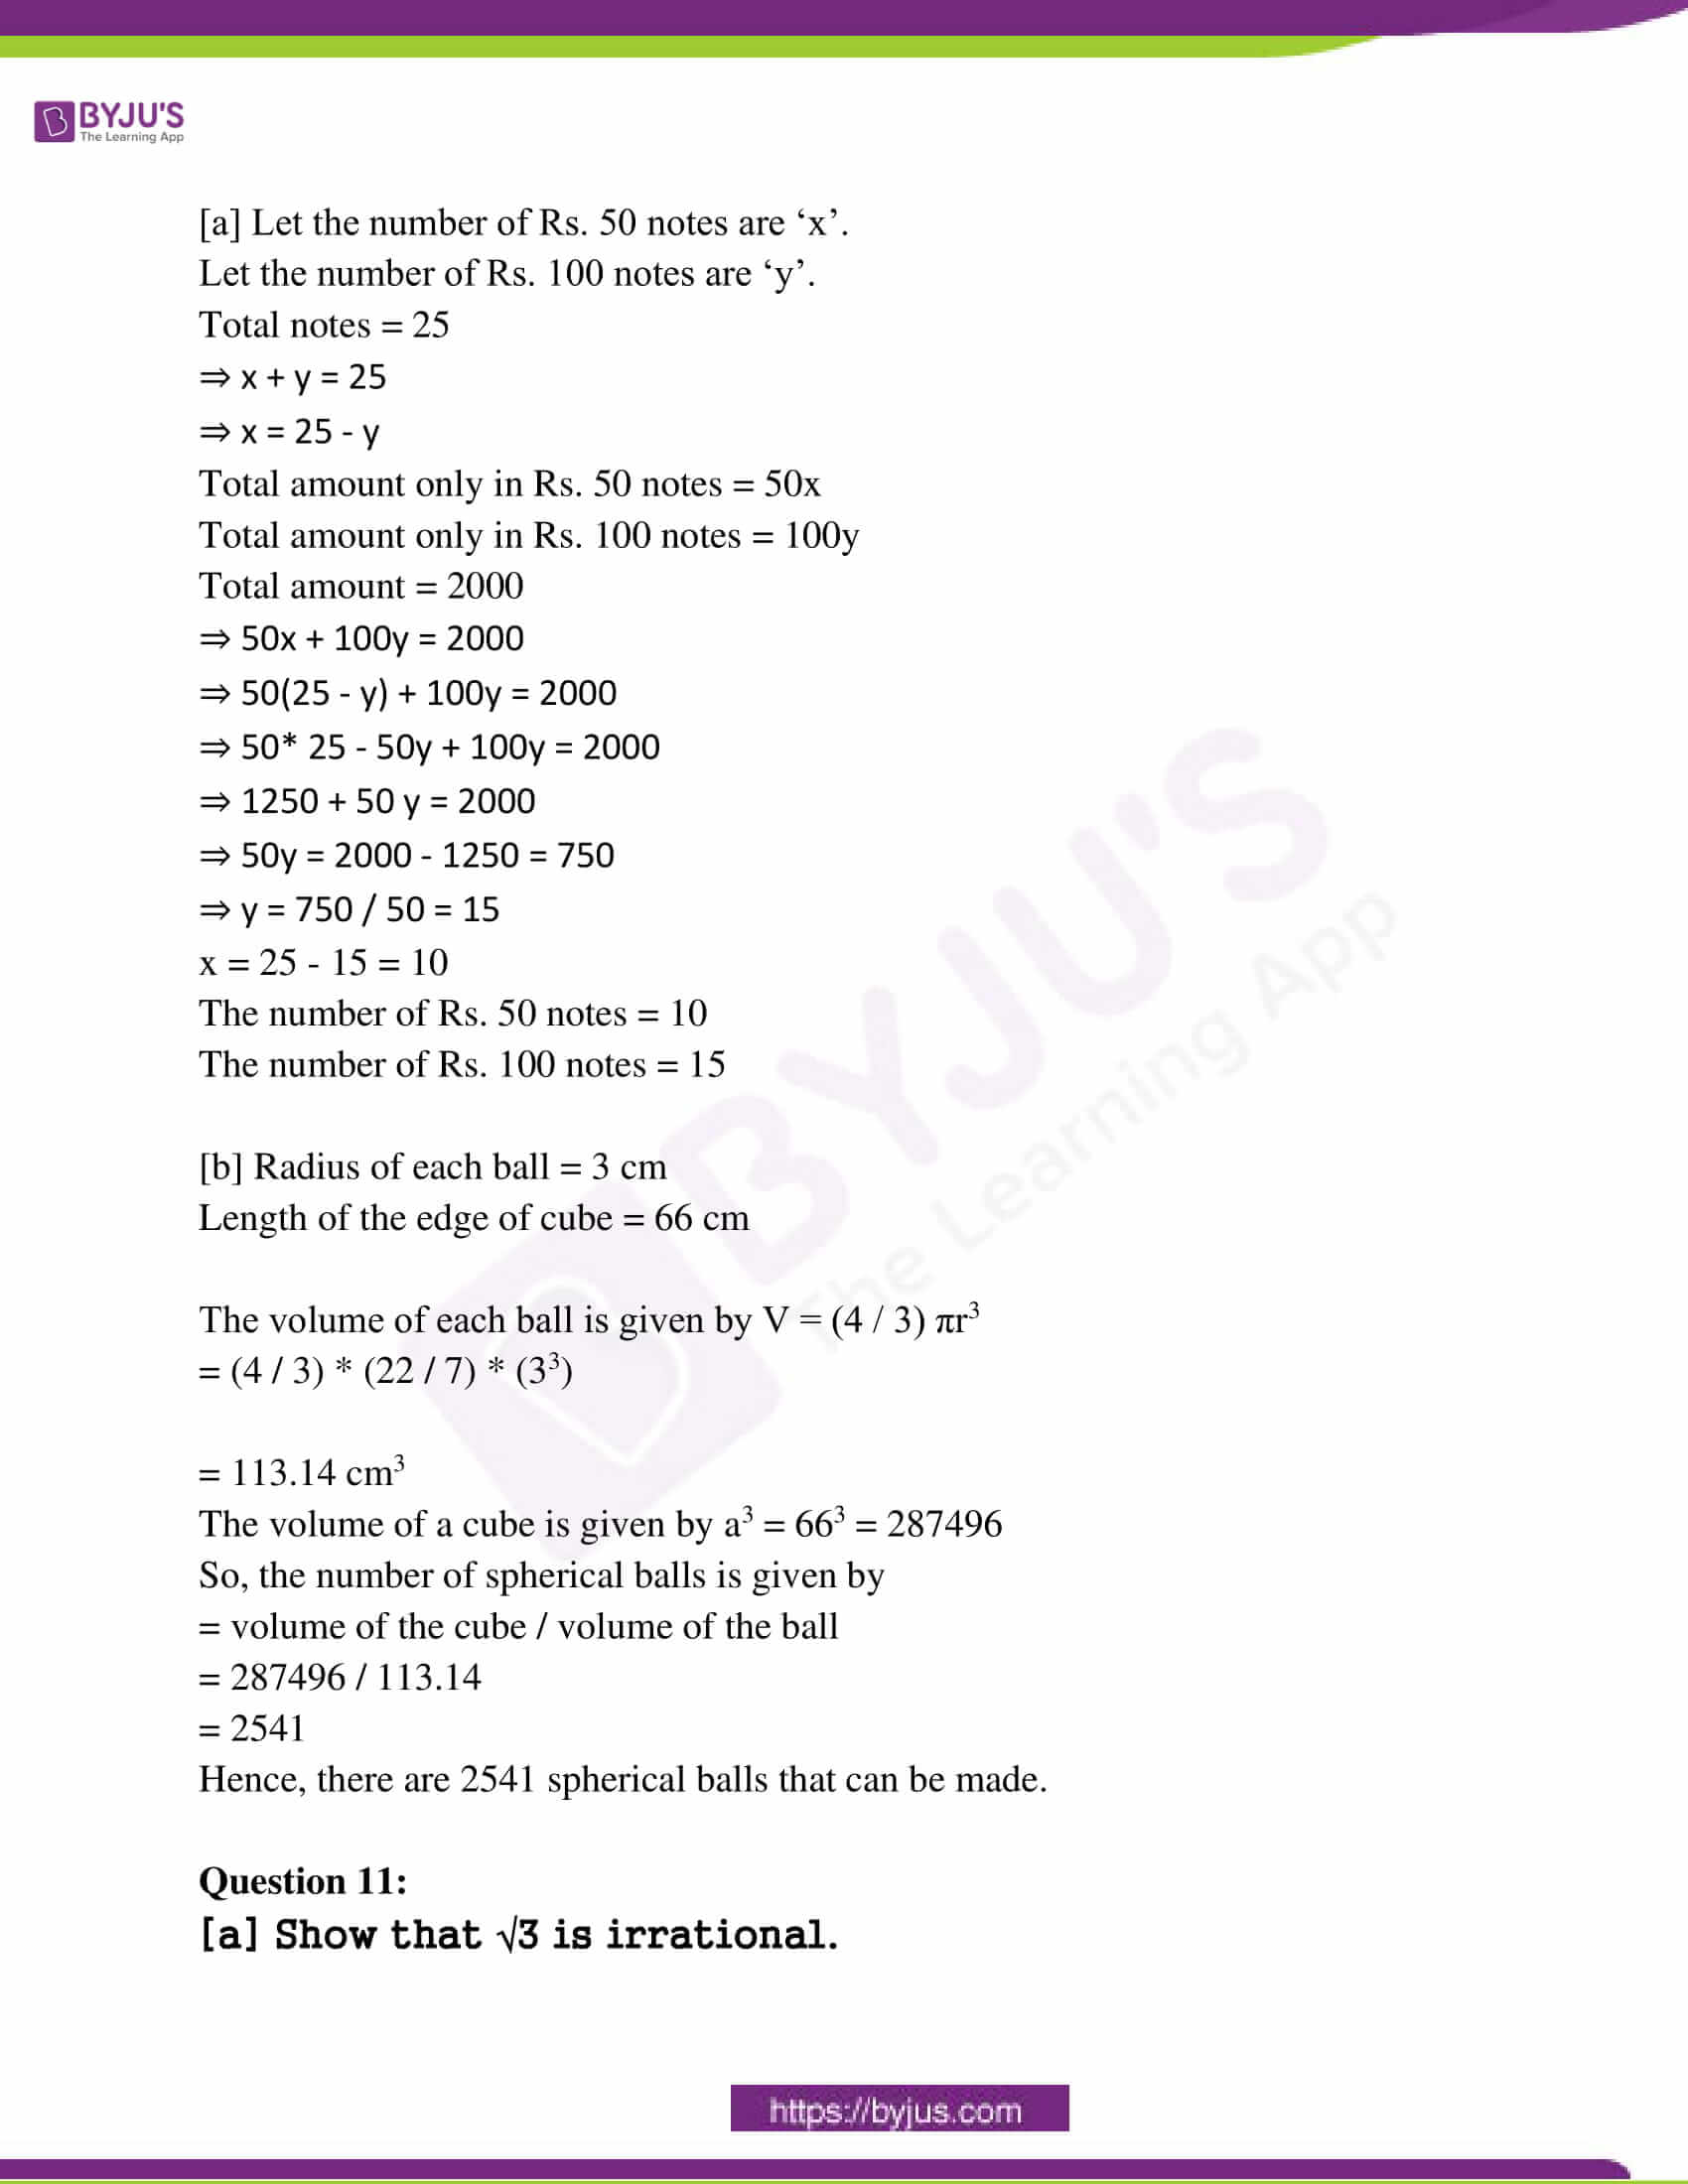 ap class 10 maths question paper 1 sol march 2018 05